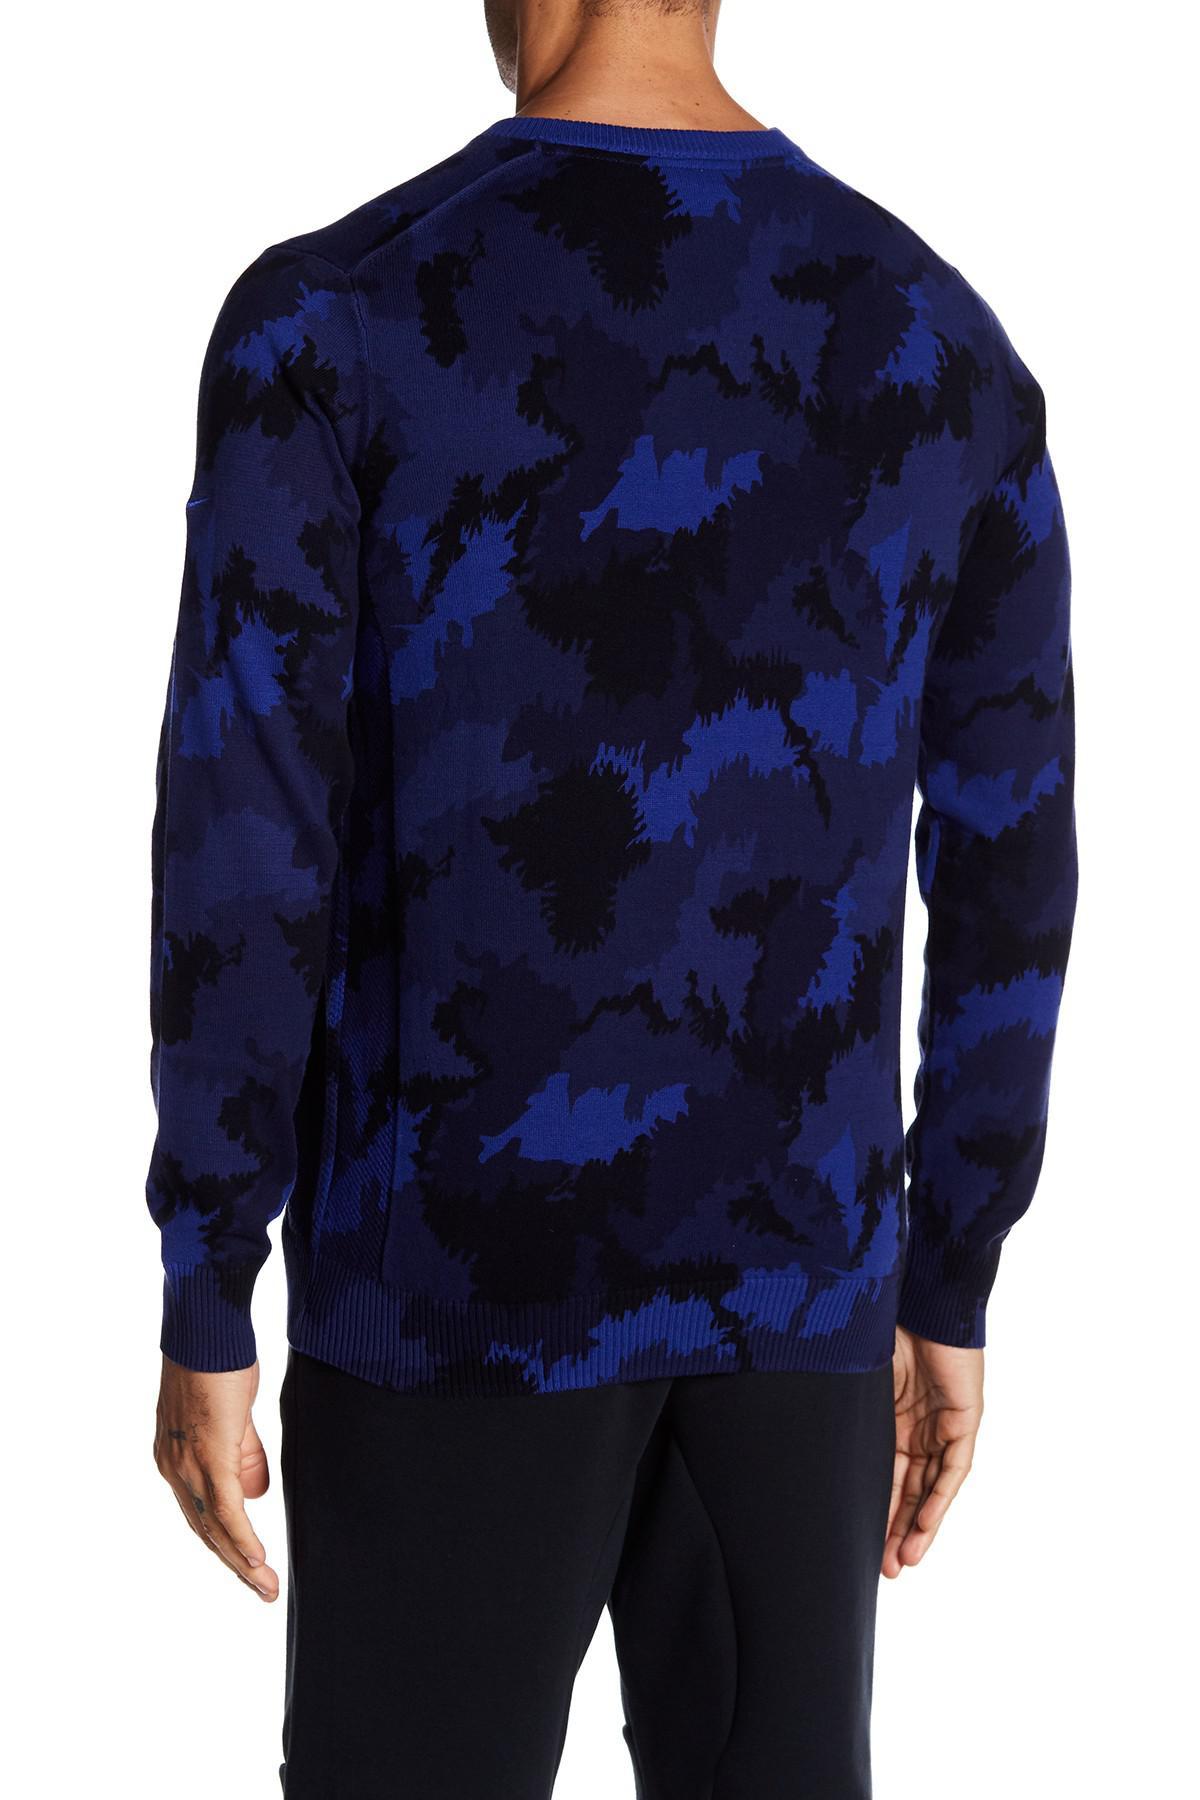 Nike Camo V-neck Sweater in Blue for Men | Lyst